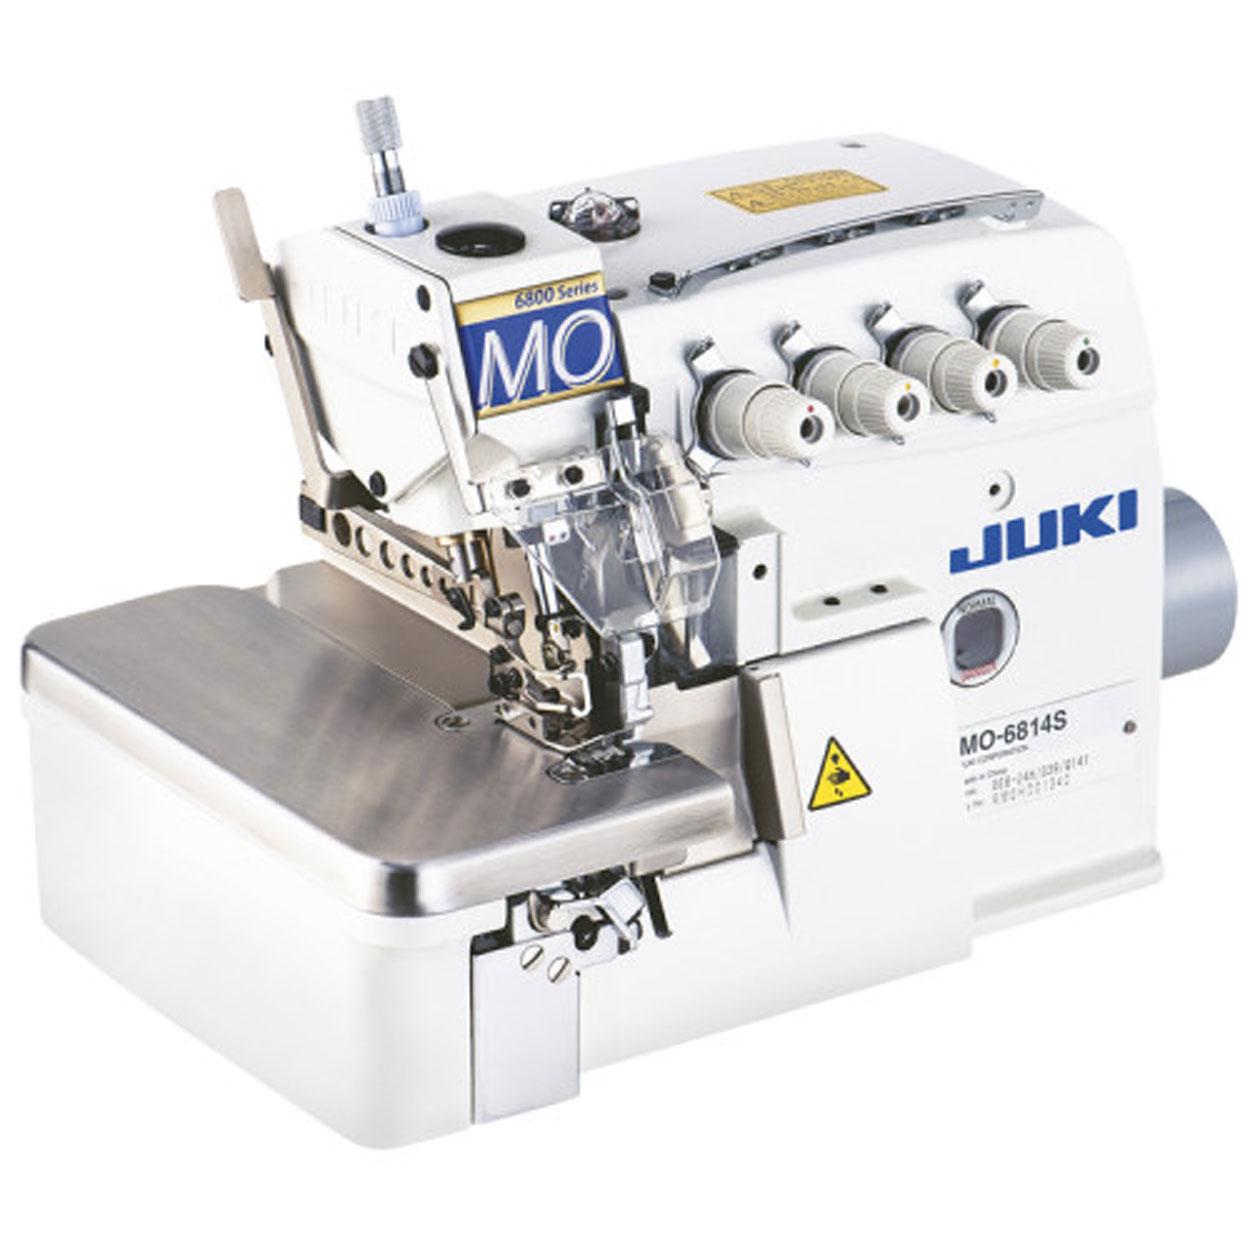 Immagine Taglia cuci industriale Juki MO-6800S